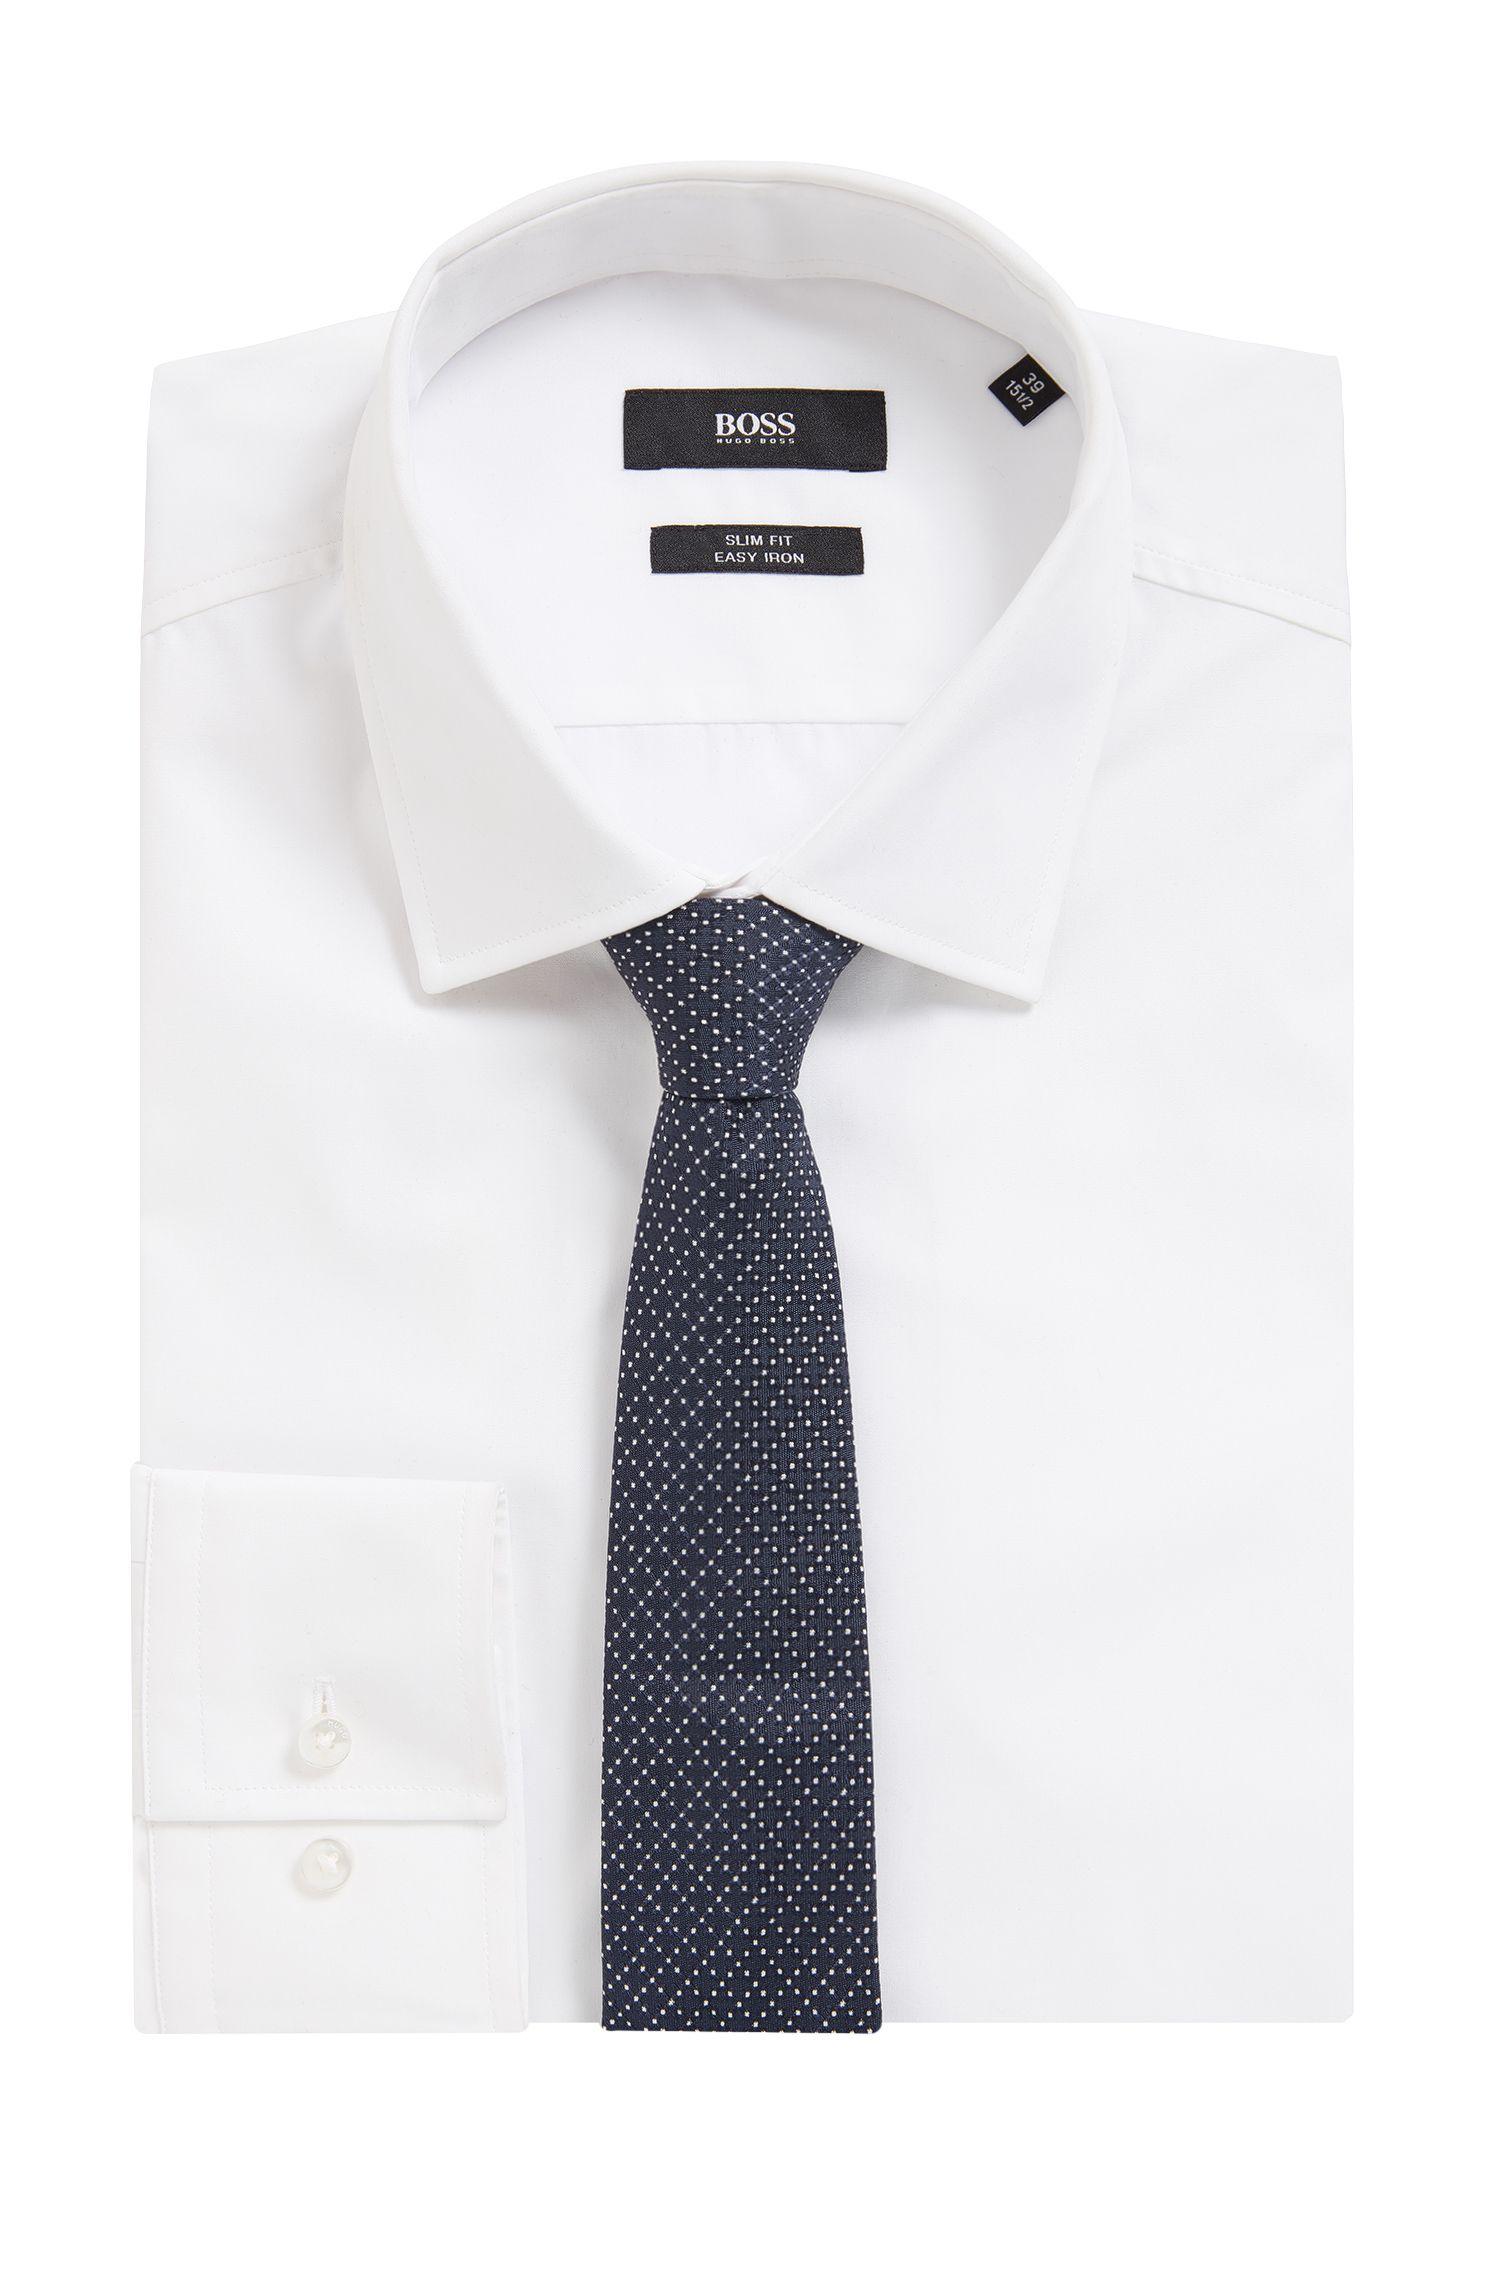 Patterned tie in yarn-dyed silk jacquard